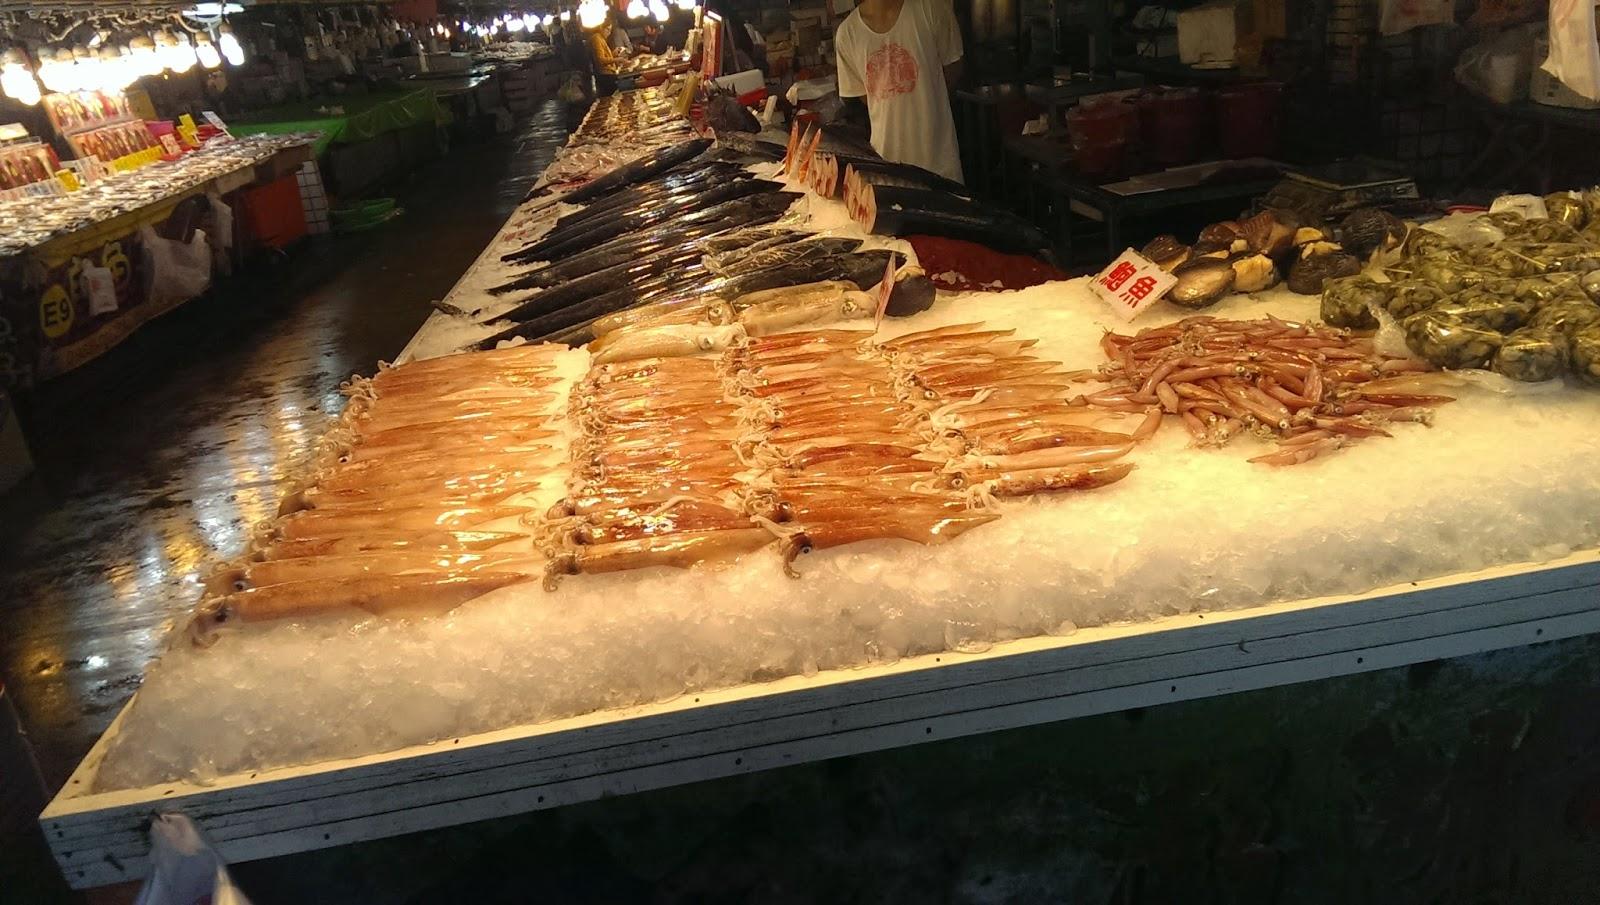 2015 02 02%2B11.55.59 - [食記] 葉家生魚片 - 布袋觀光漁市中的鮮魚餐廳